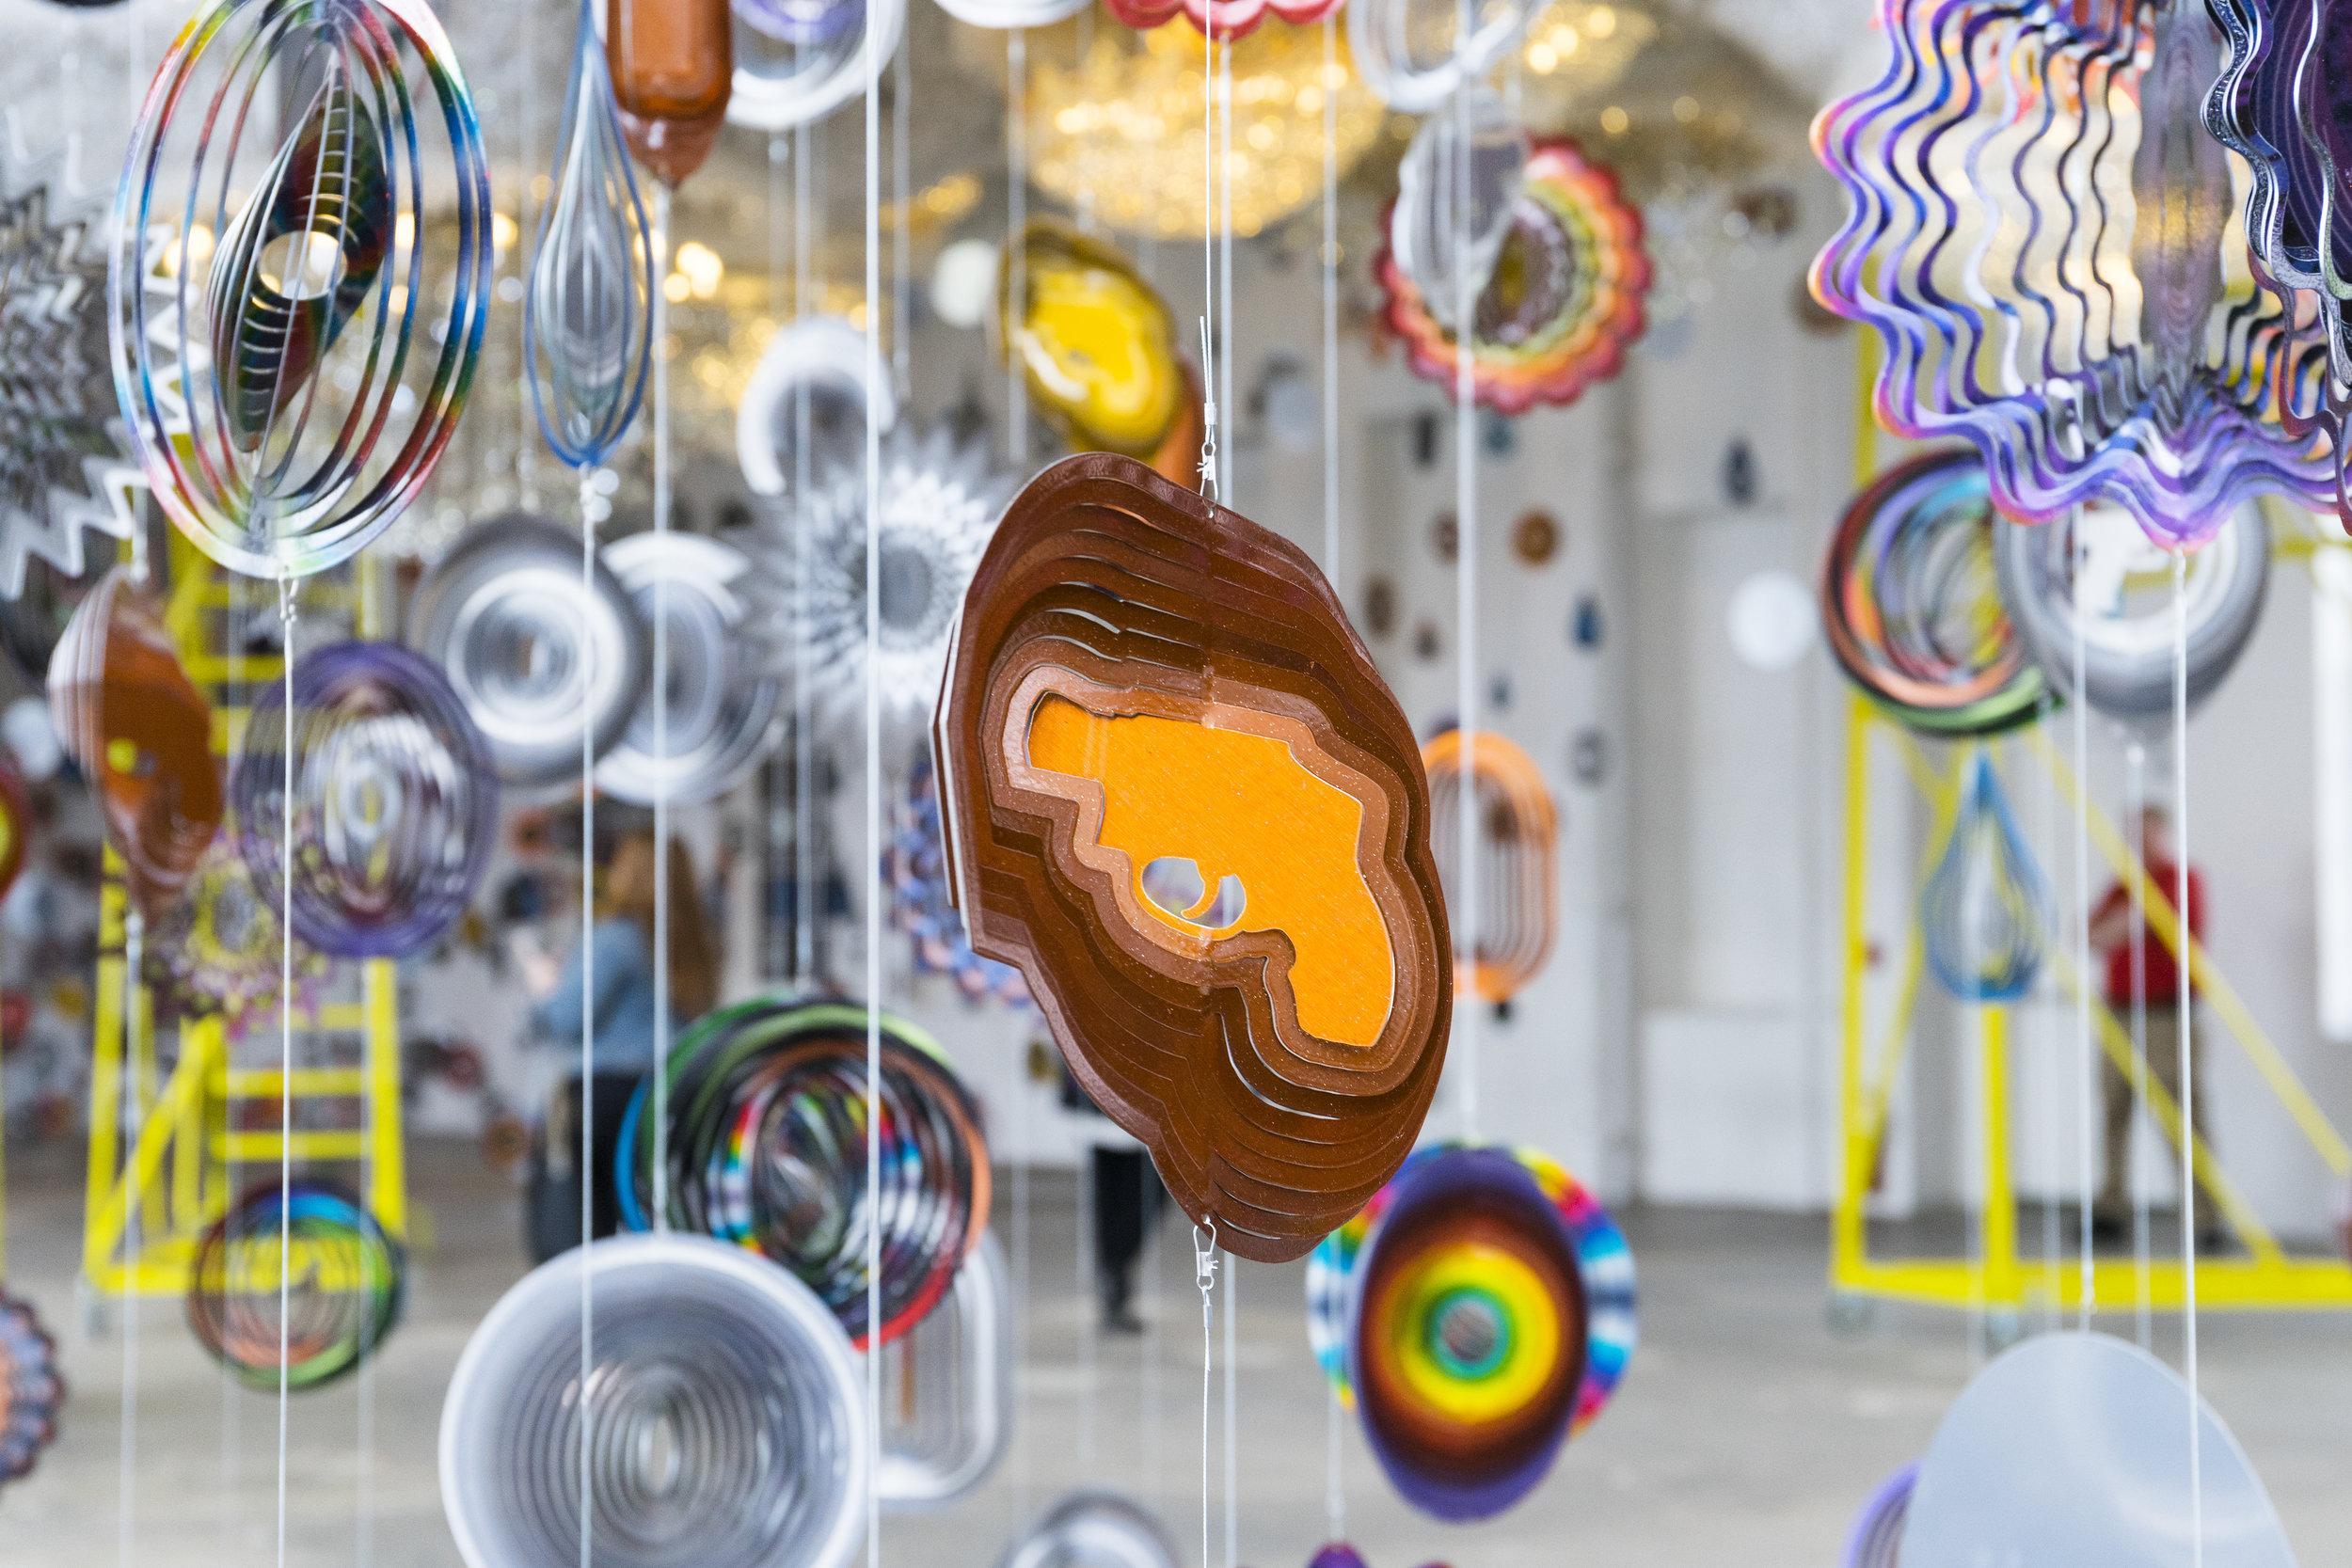 Nick Cave   Until  (installation view), 2016  MASS MoCA